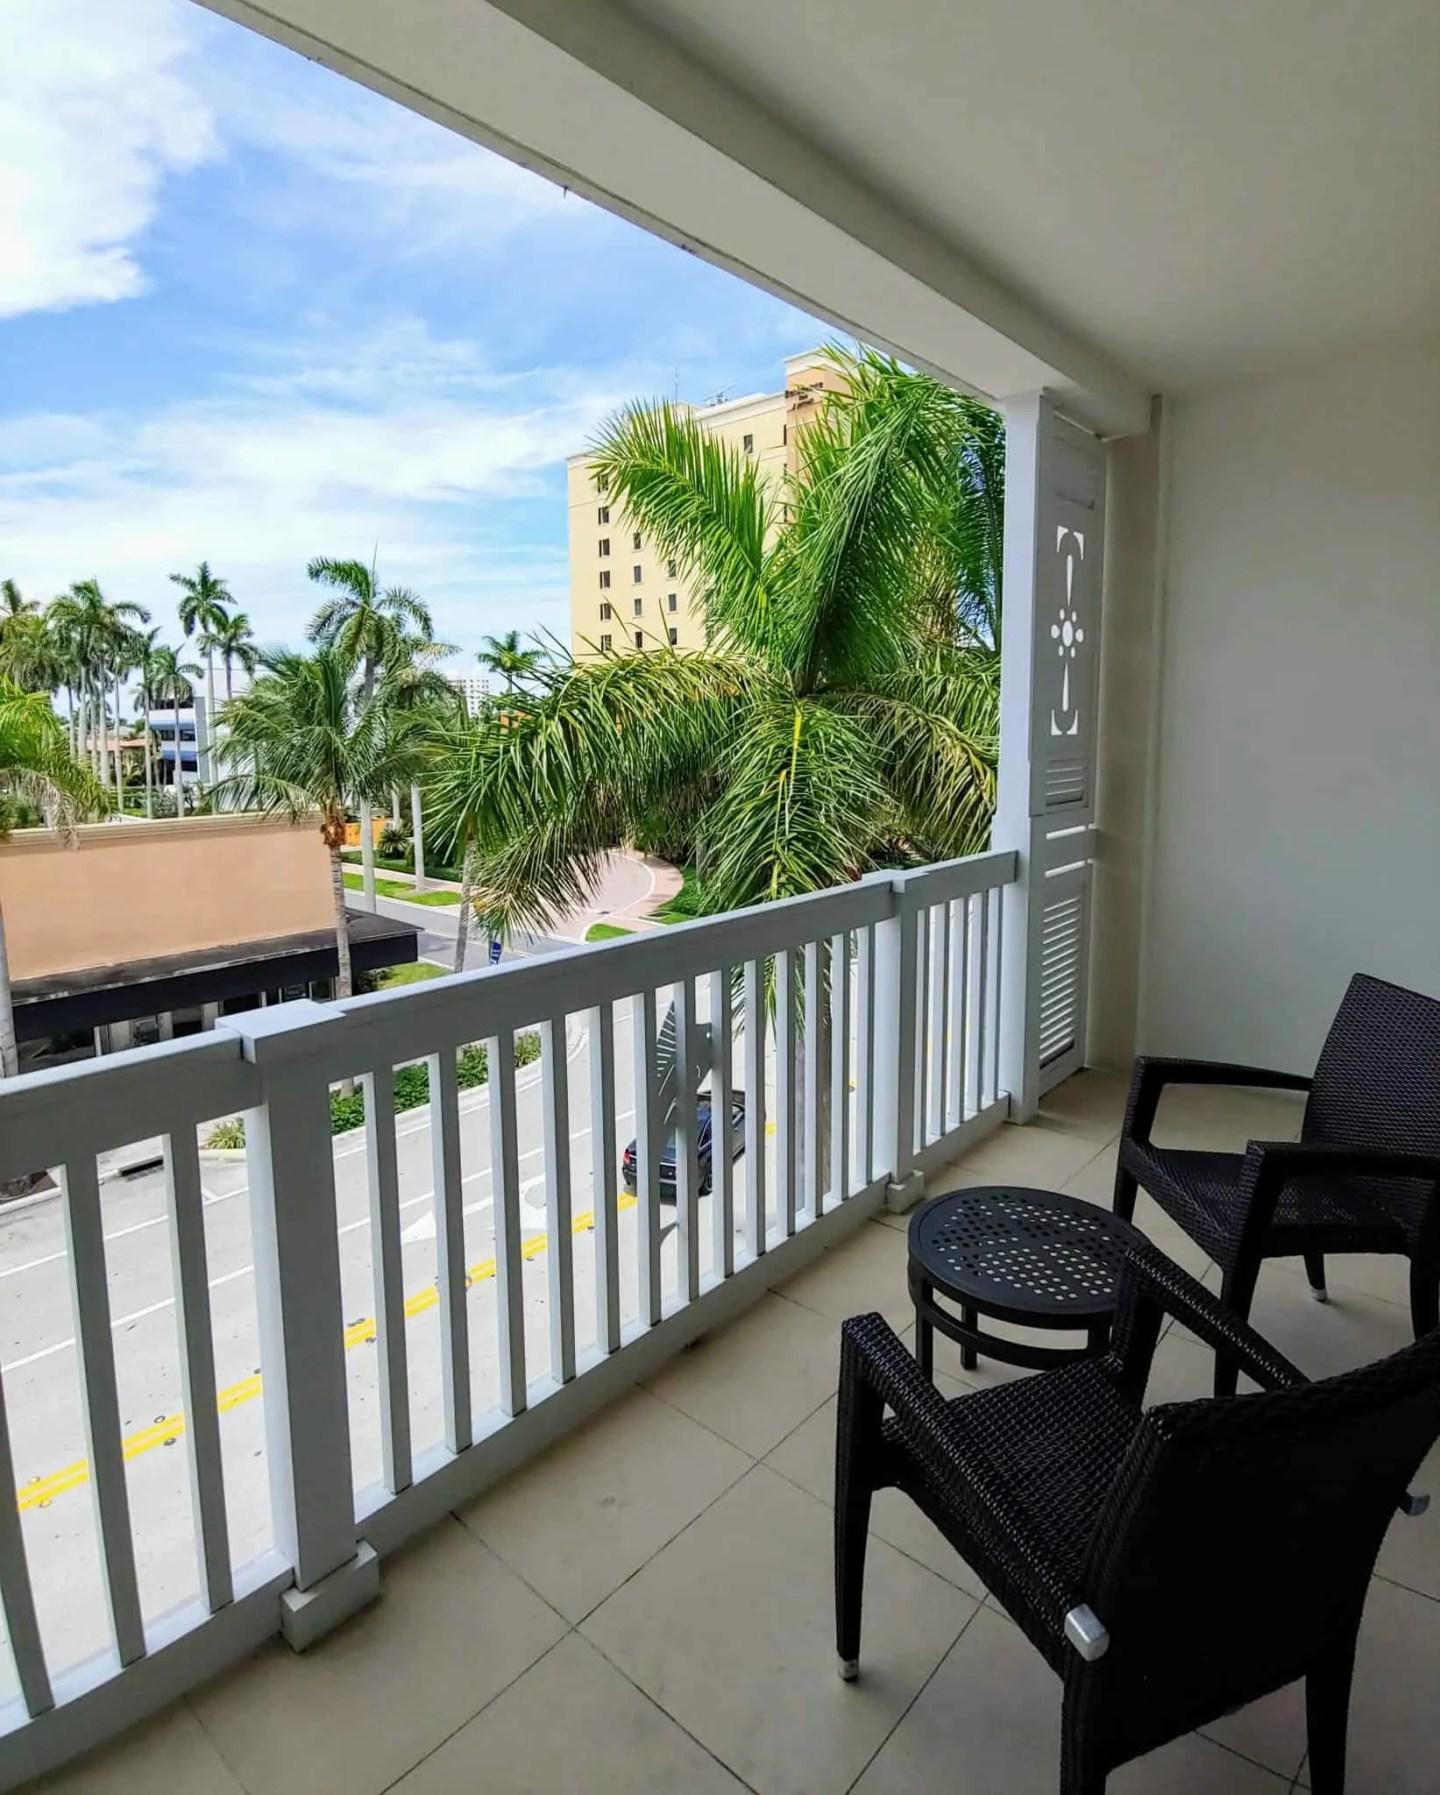 Private balcony overlooking Delray